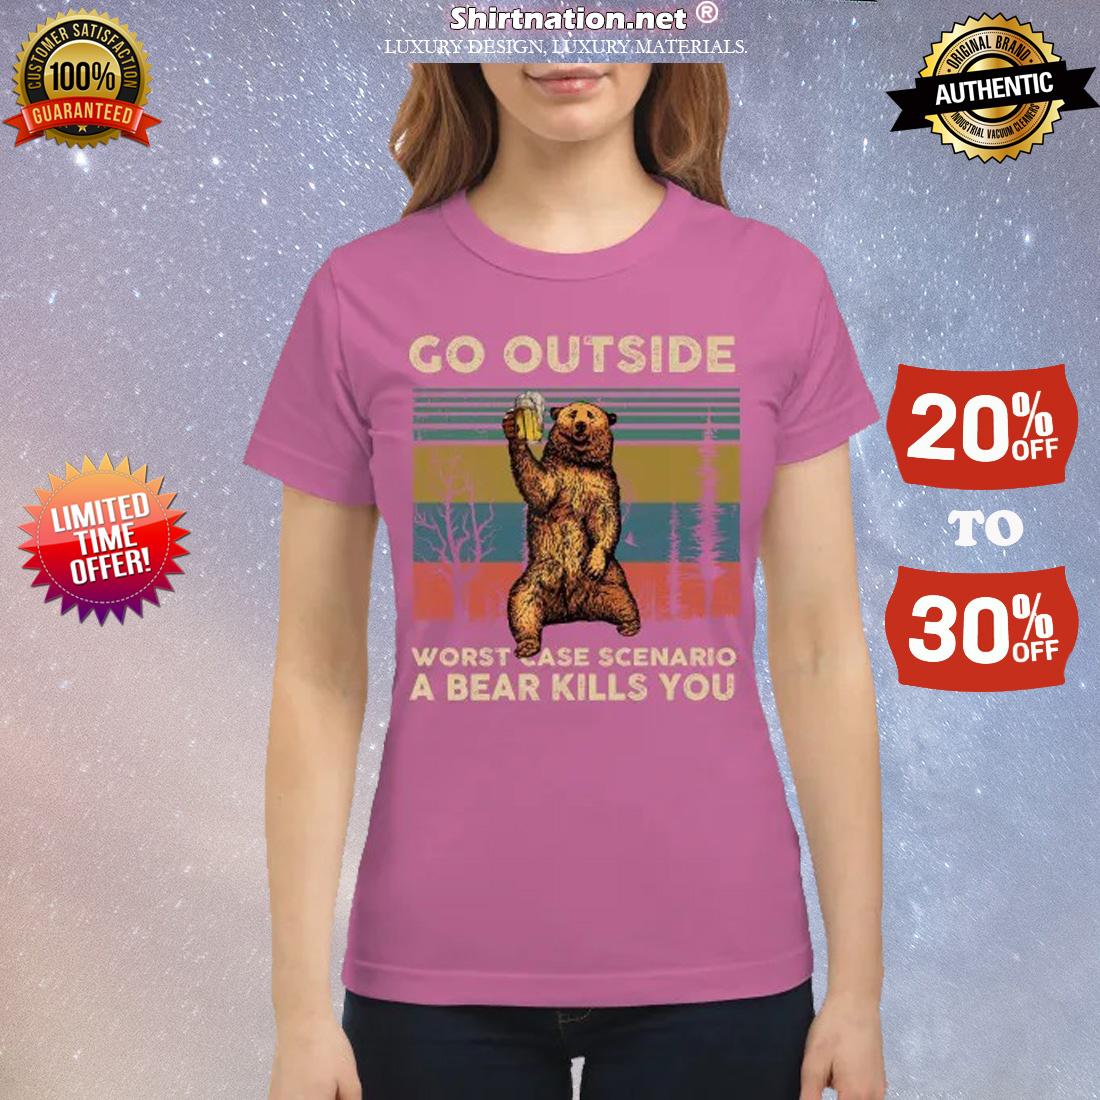 Go outside worst case scenario a bear kills you classic shirt